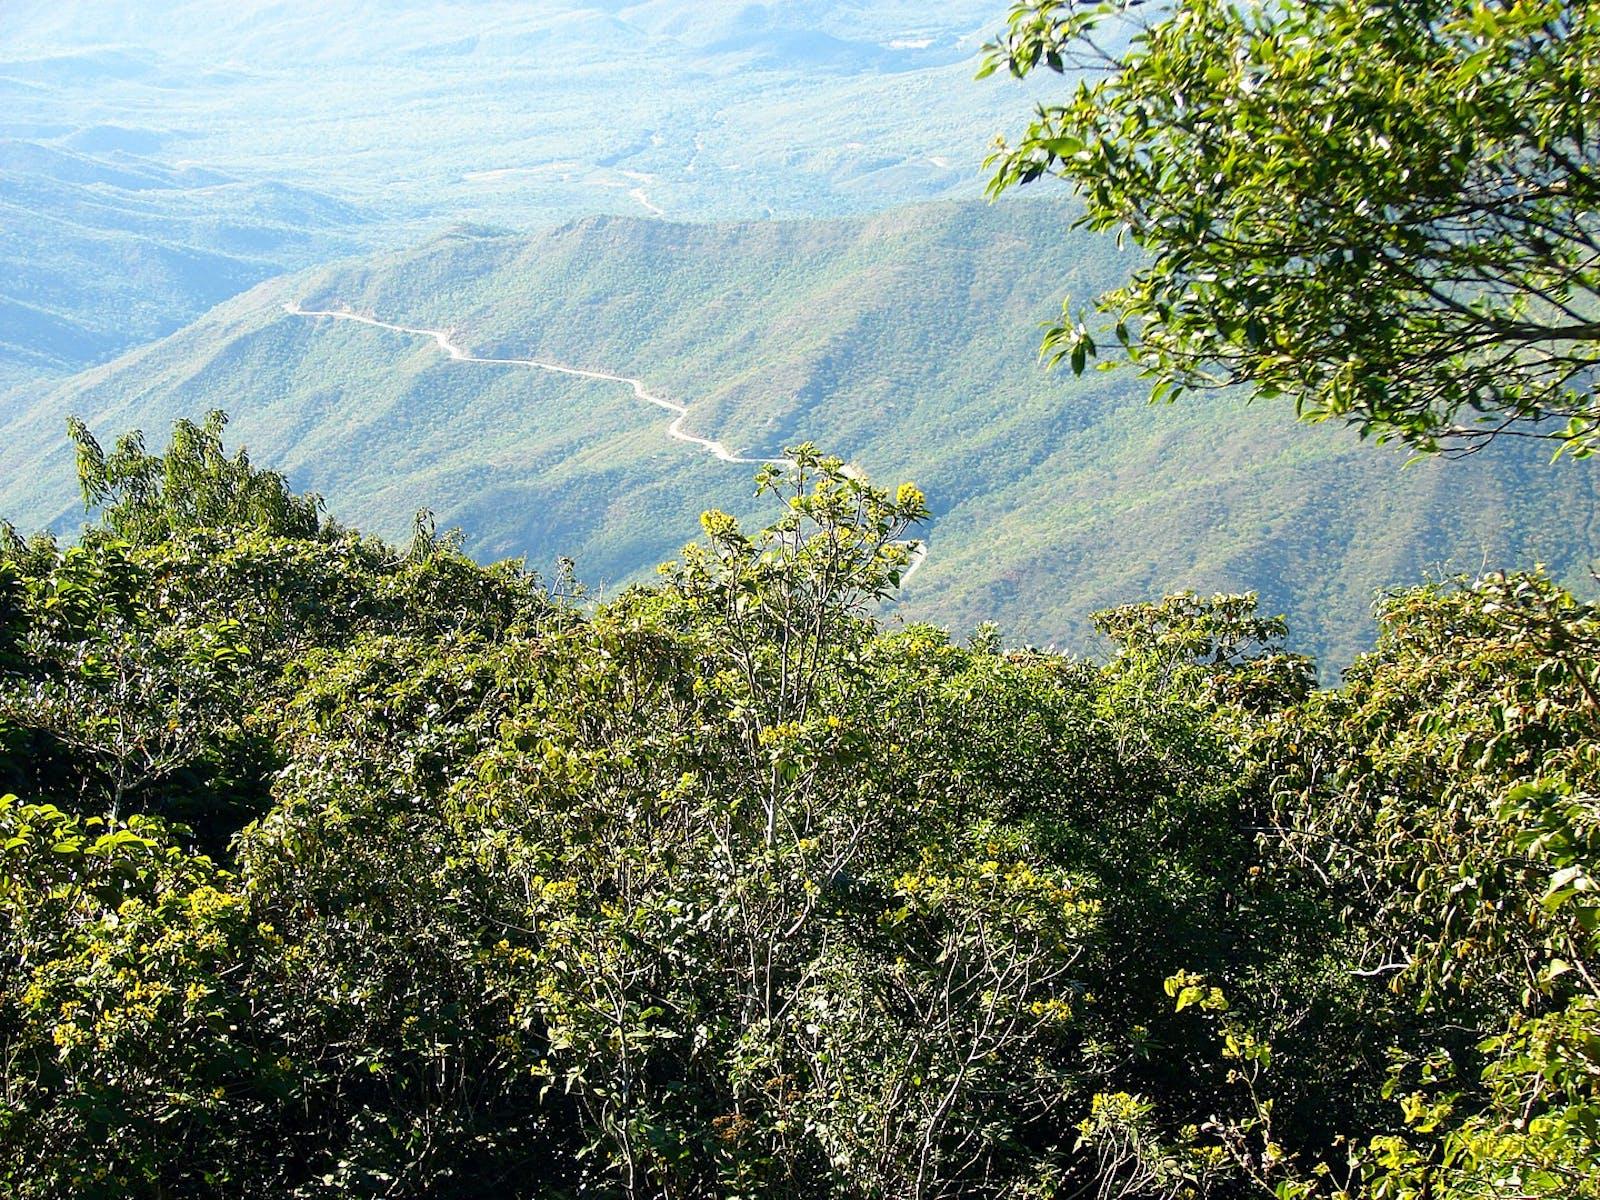 Lara-Falcón Dry Forests